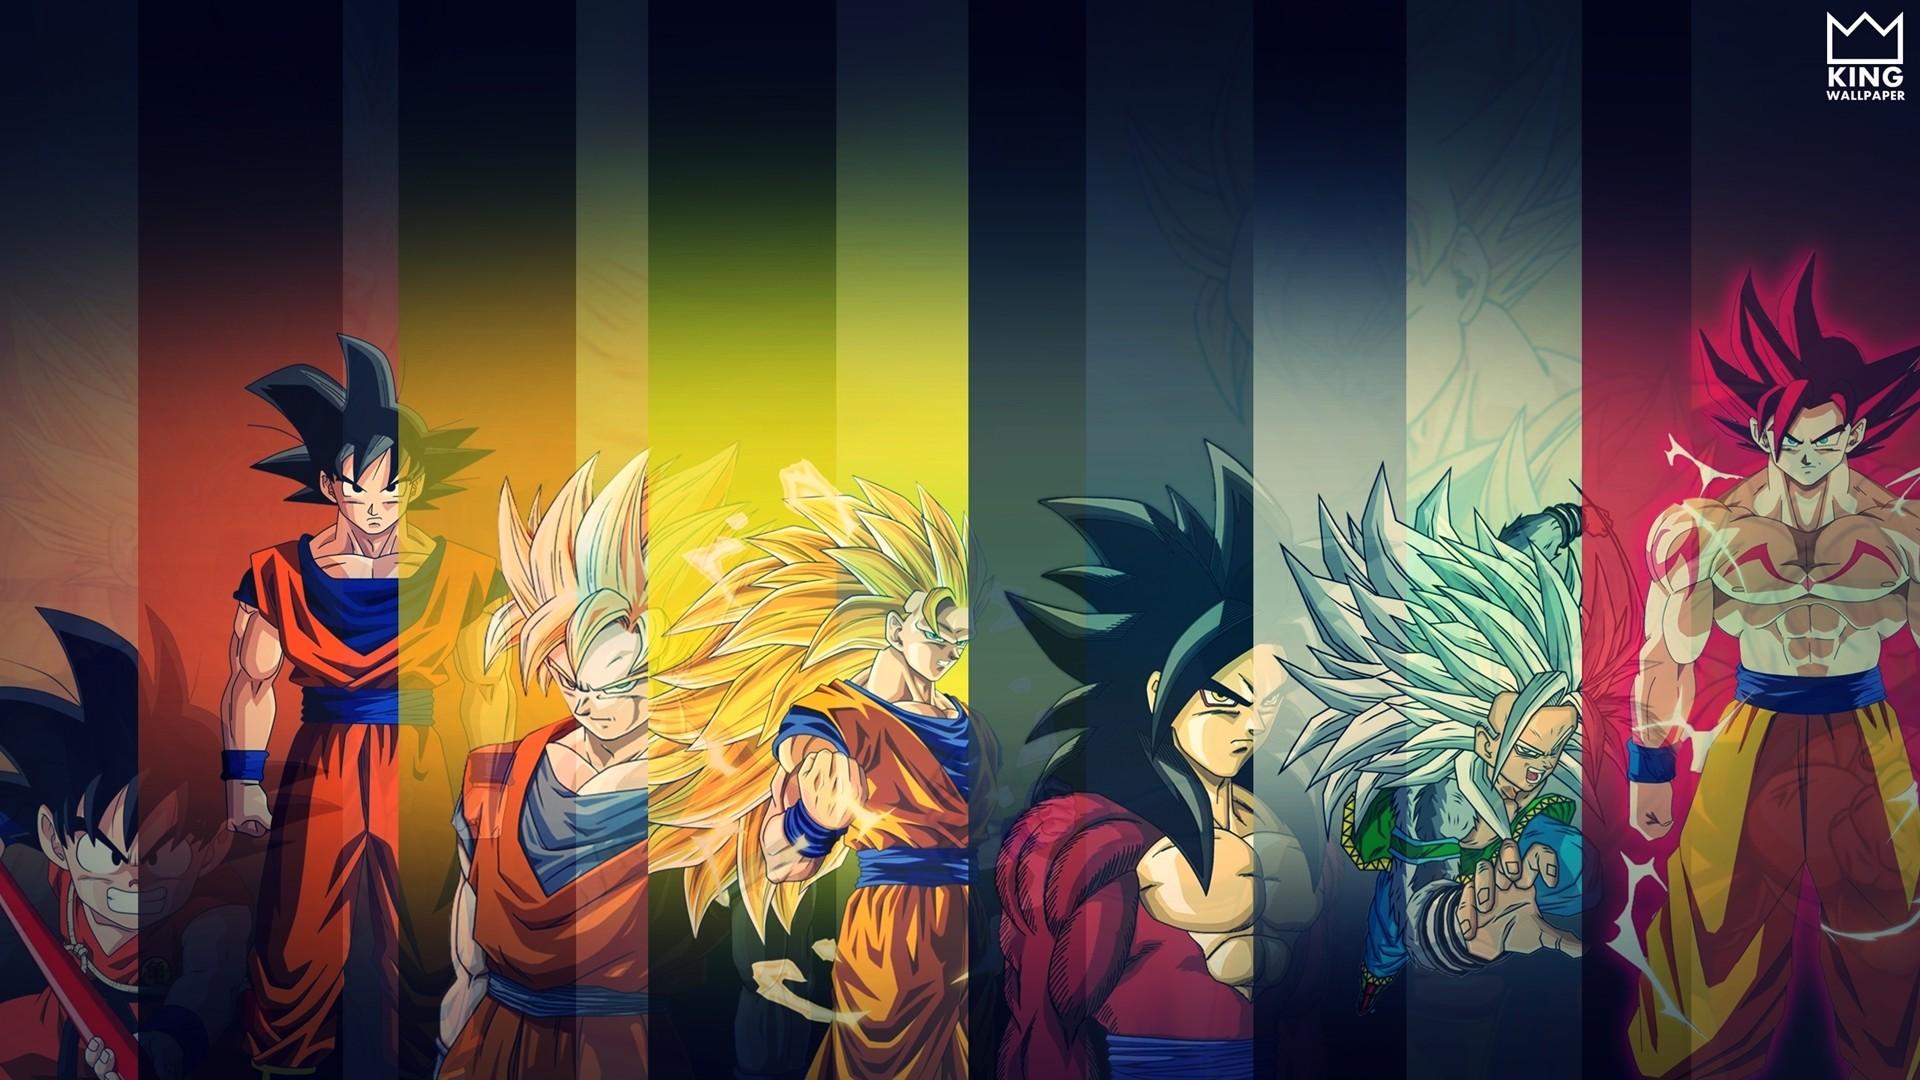 Best Goku Hd For PC Dragon Ball Z Wallpaper Wp400255